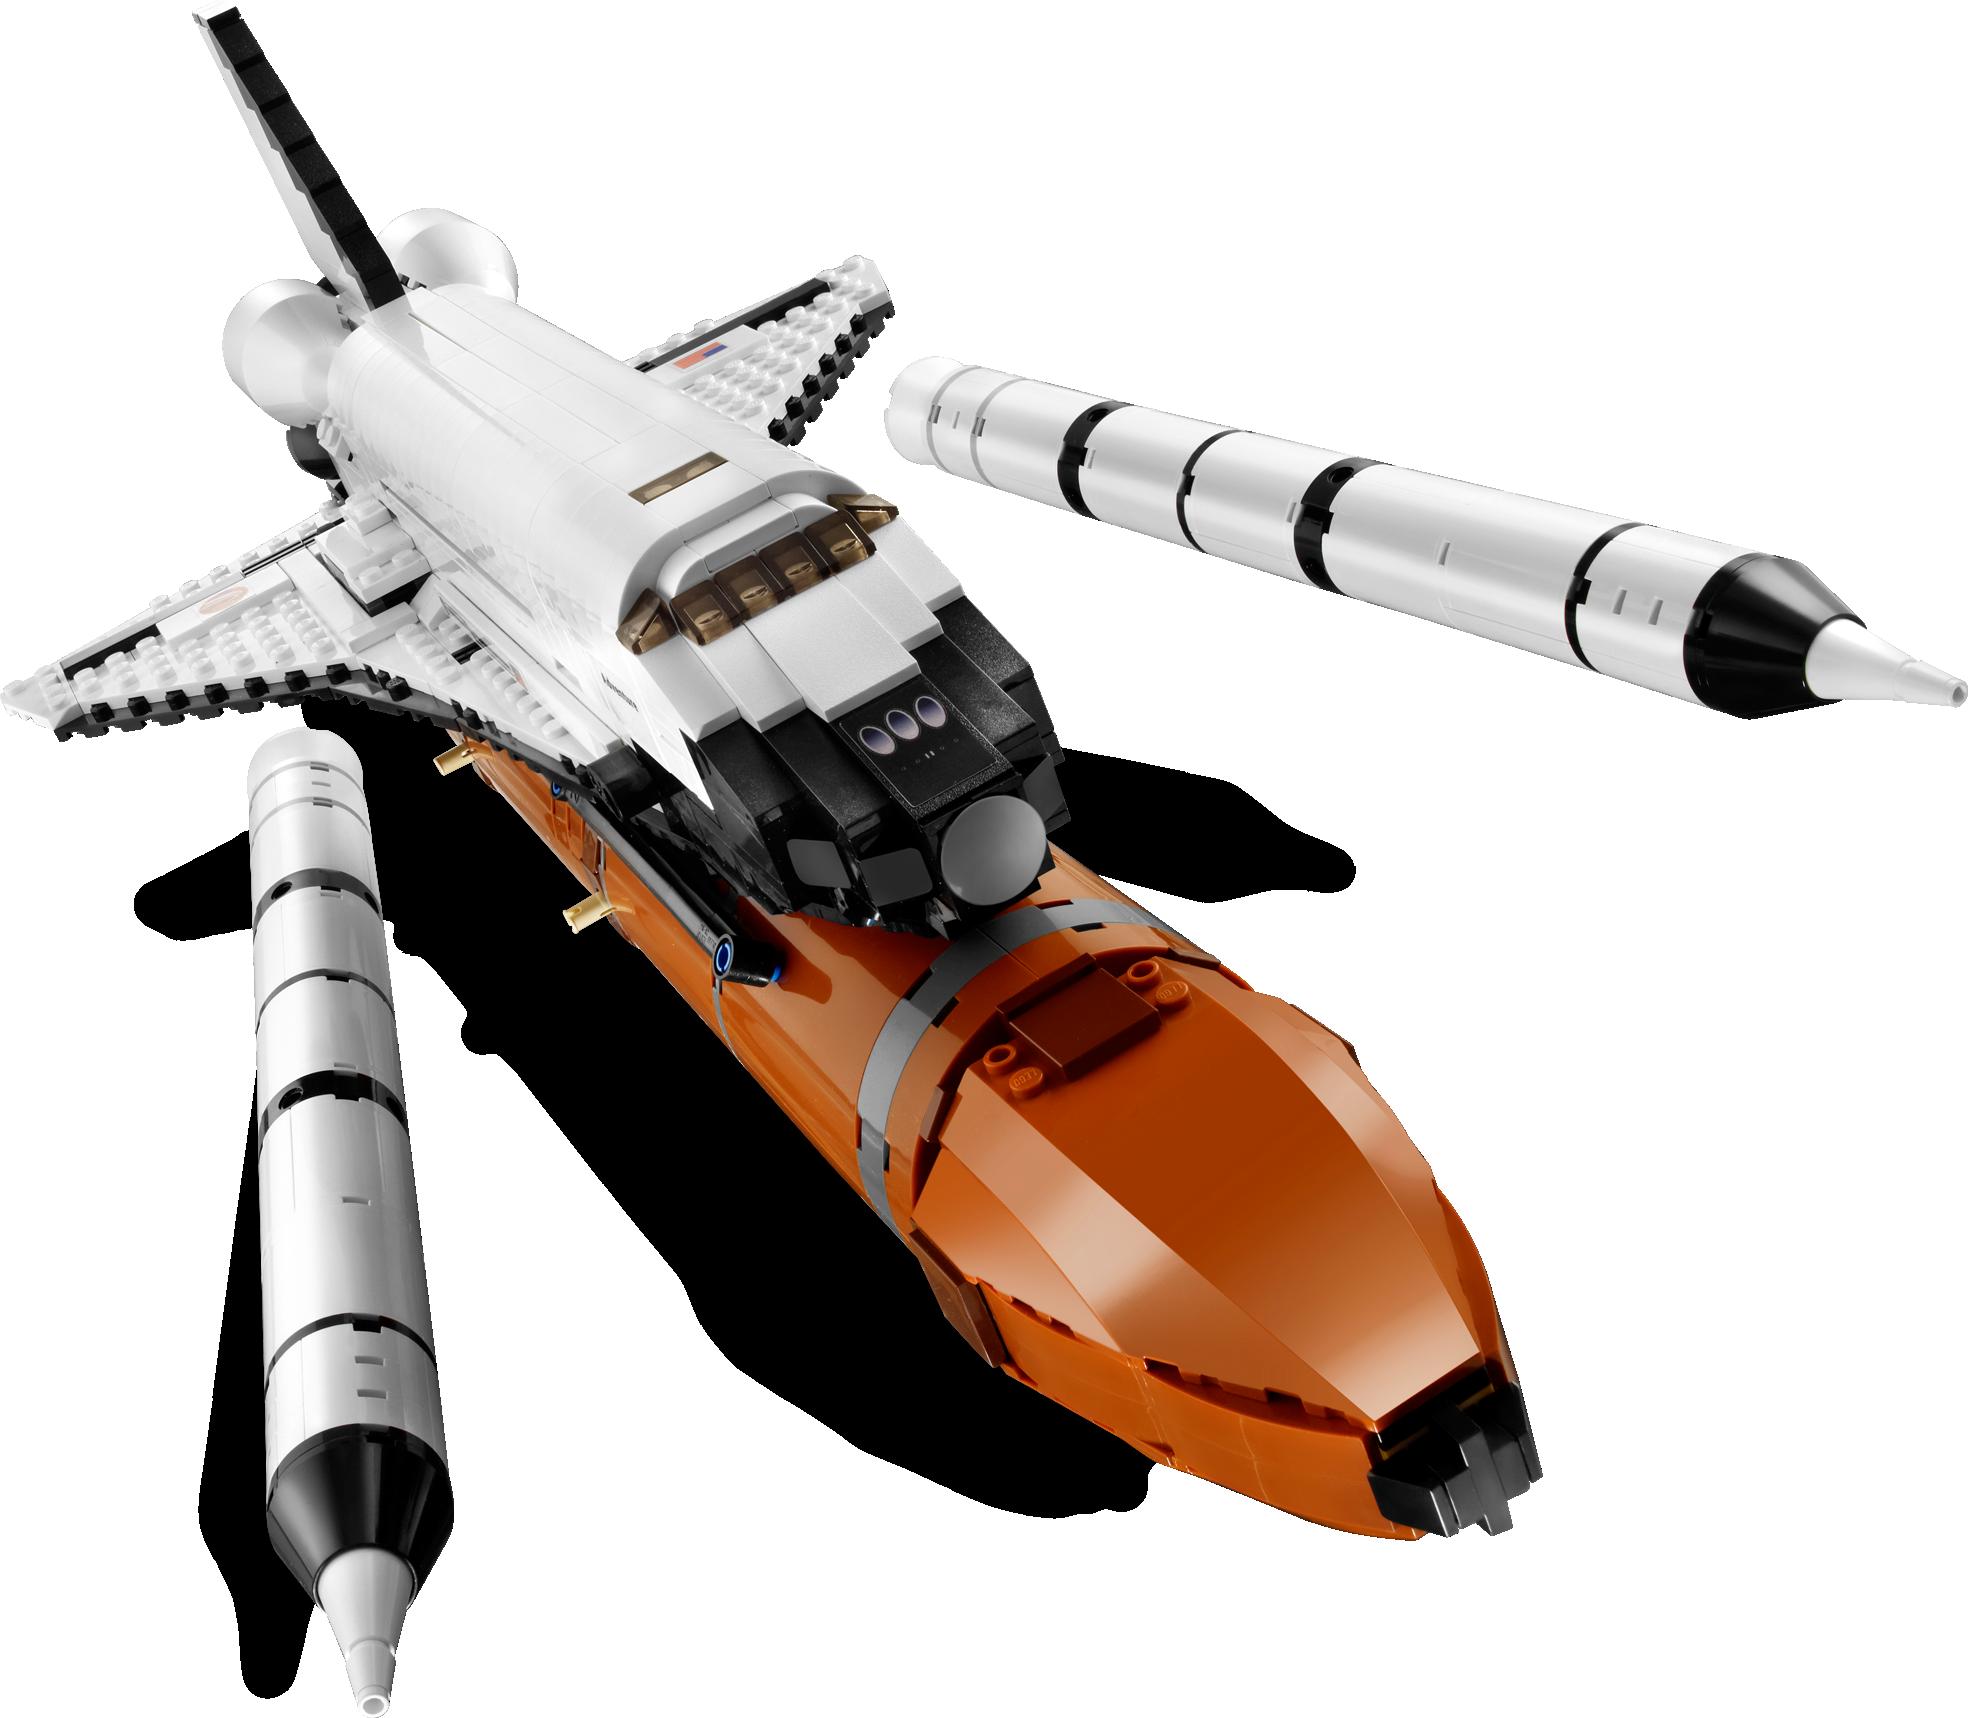 Shuttle Adventure